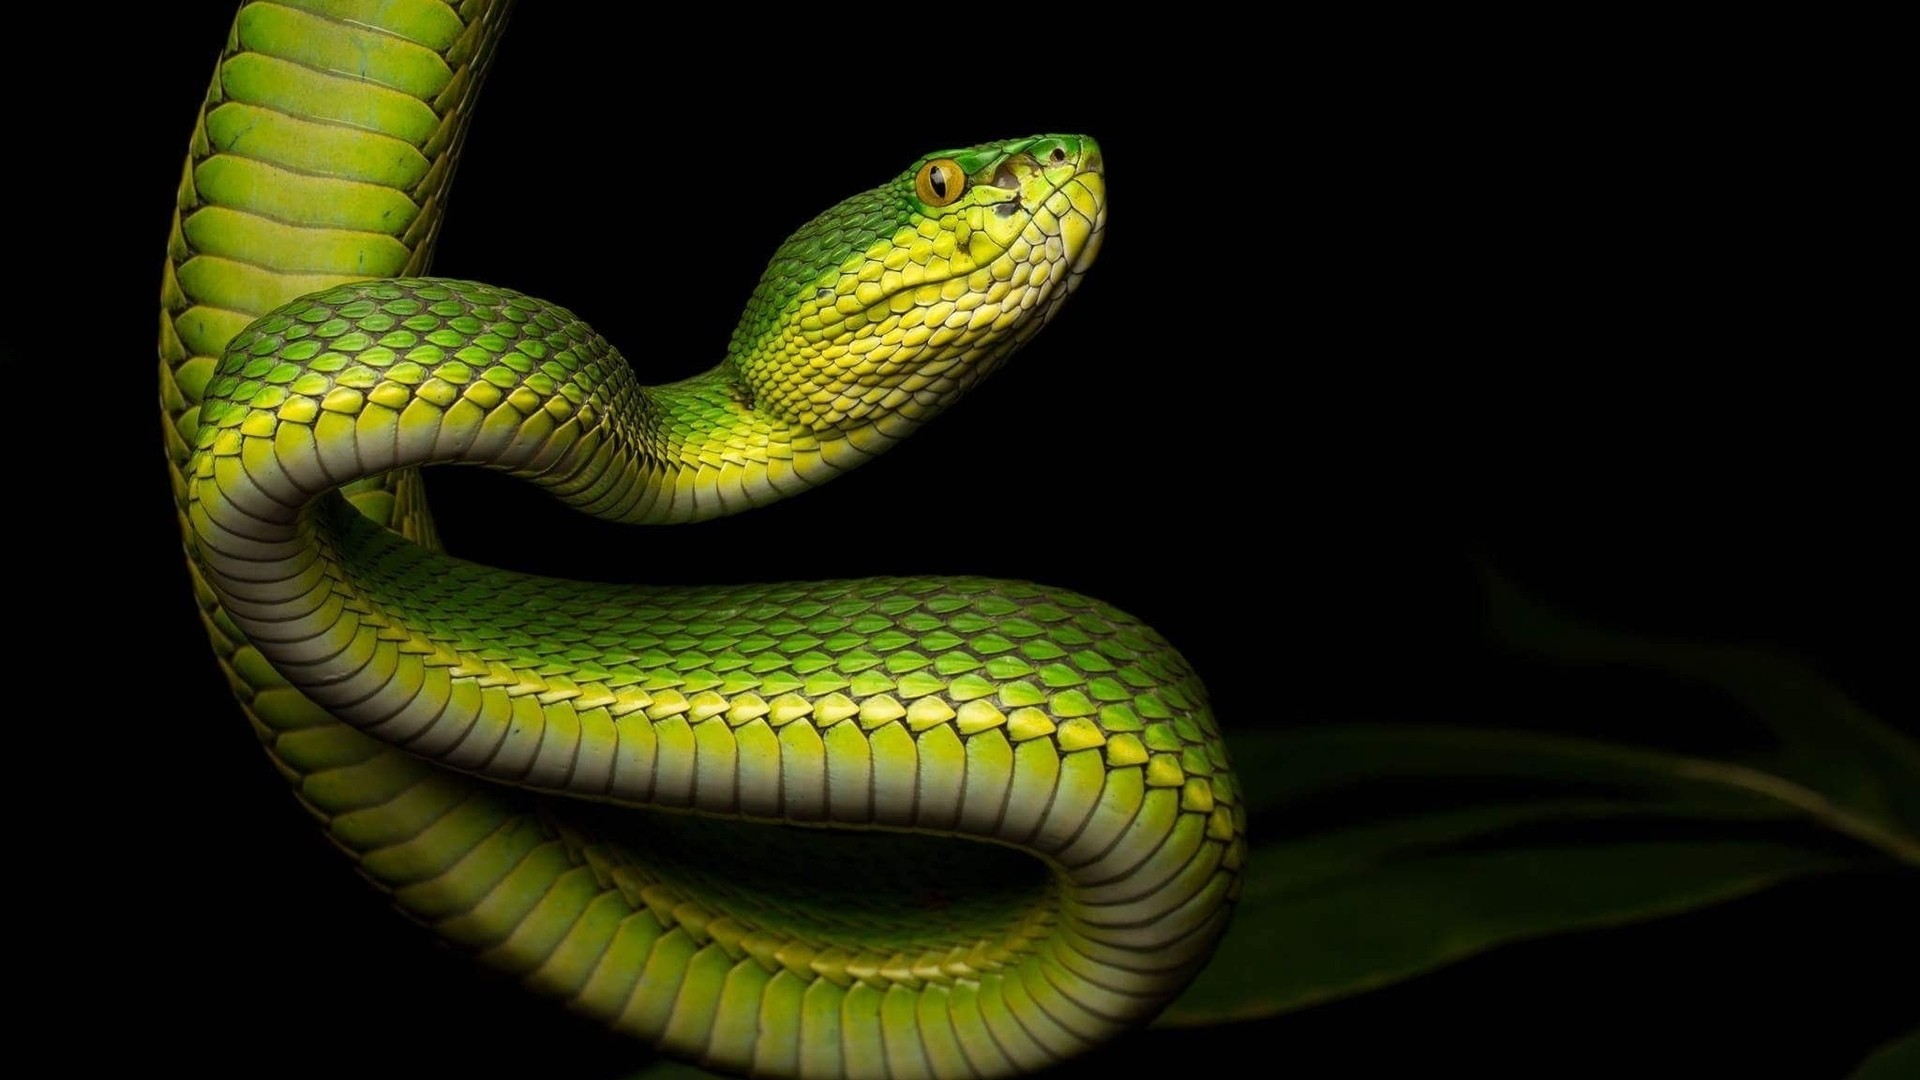 Snake High Quality